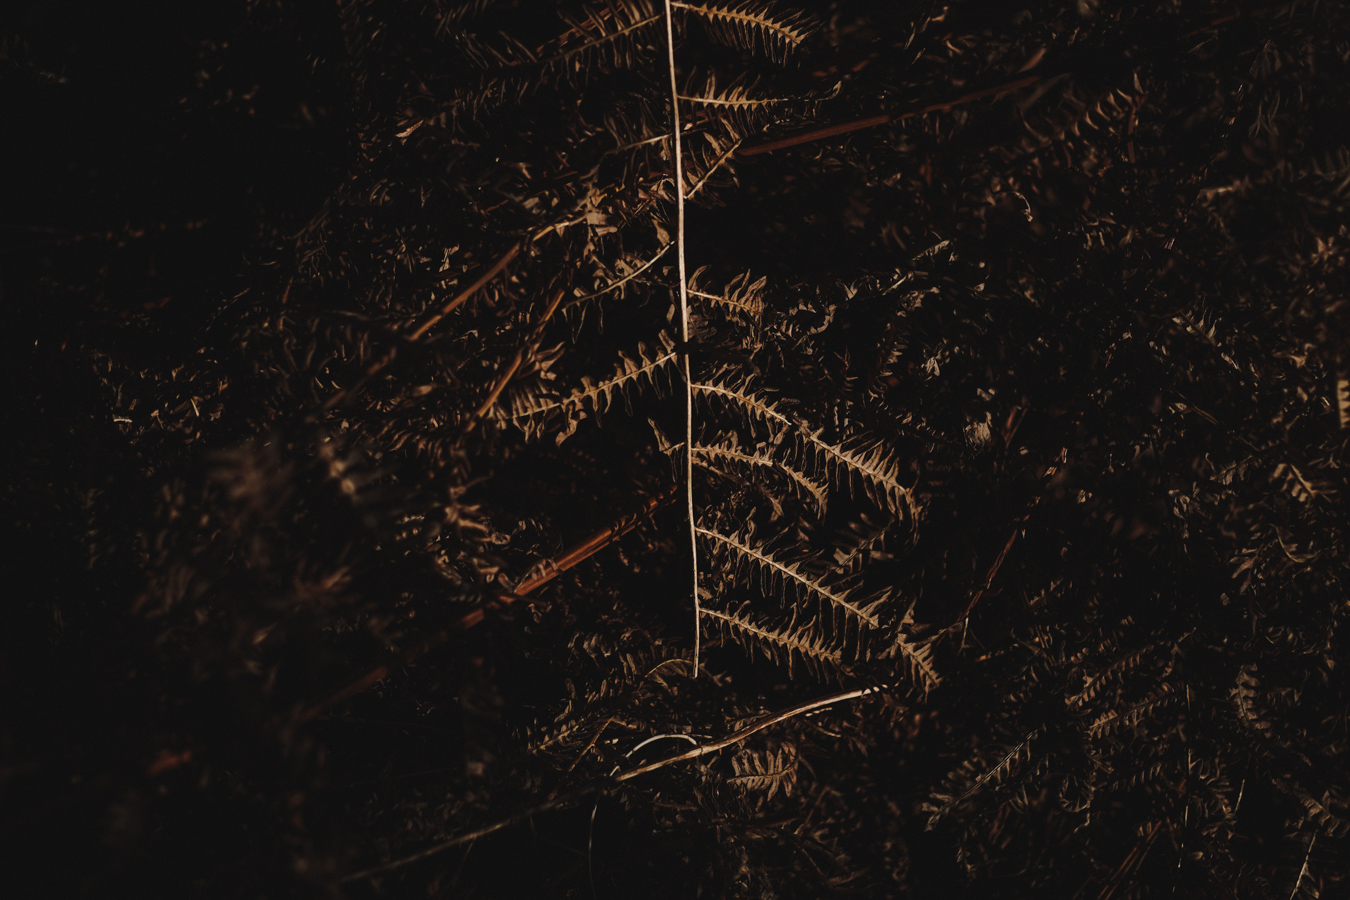 trees-4.JPG